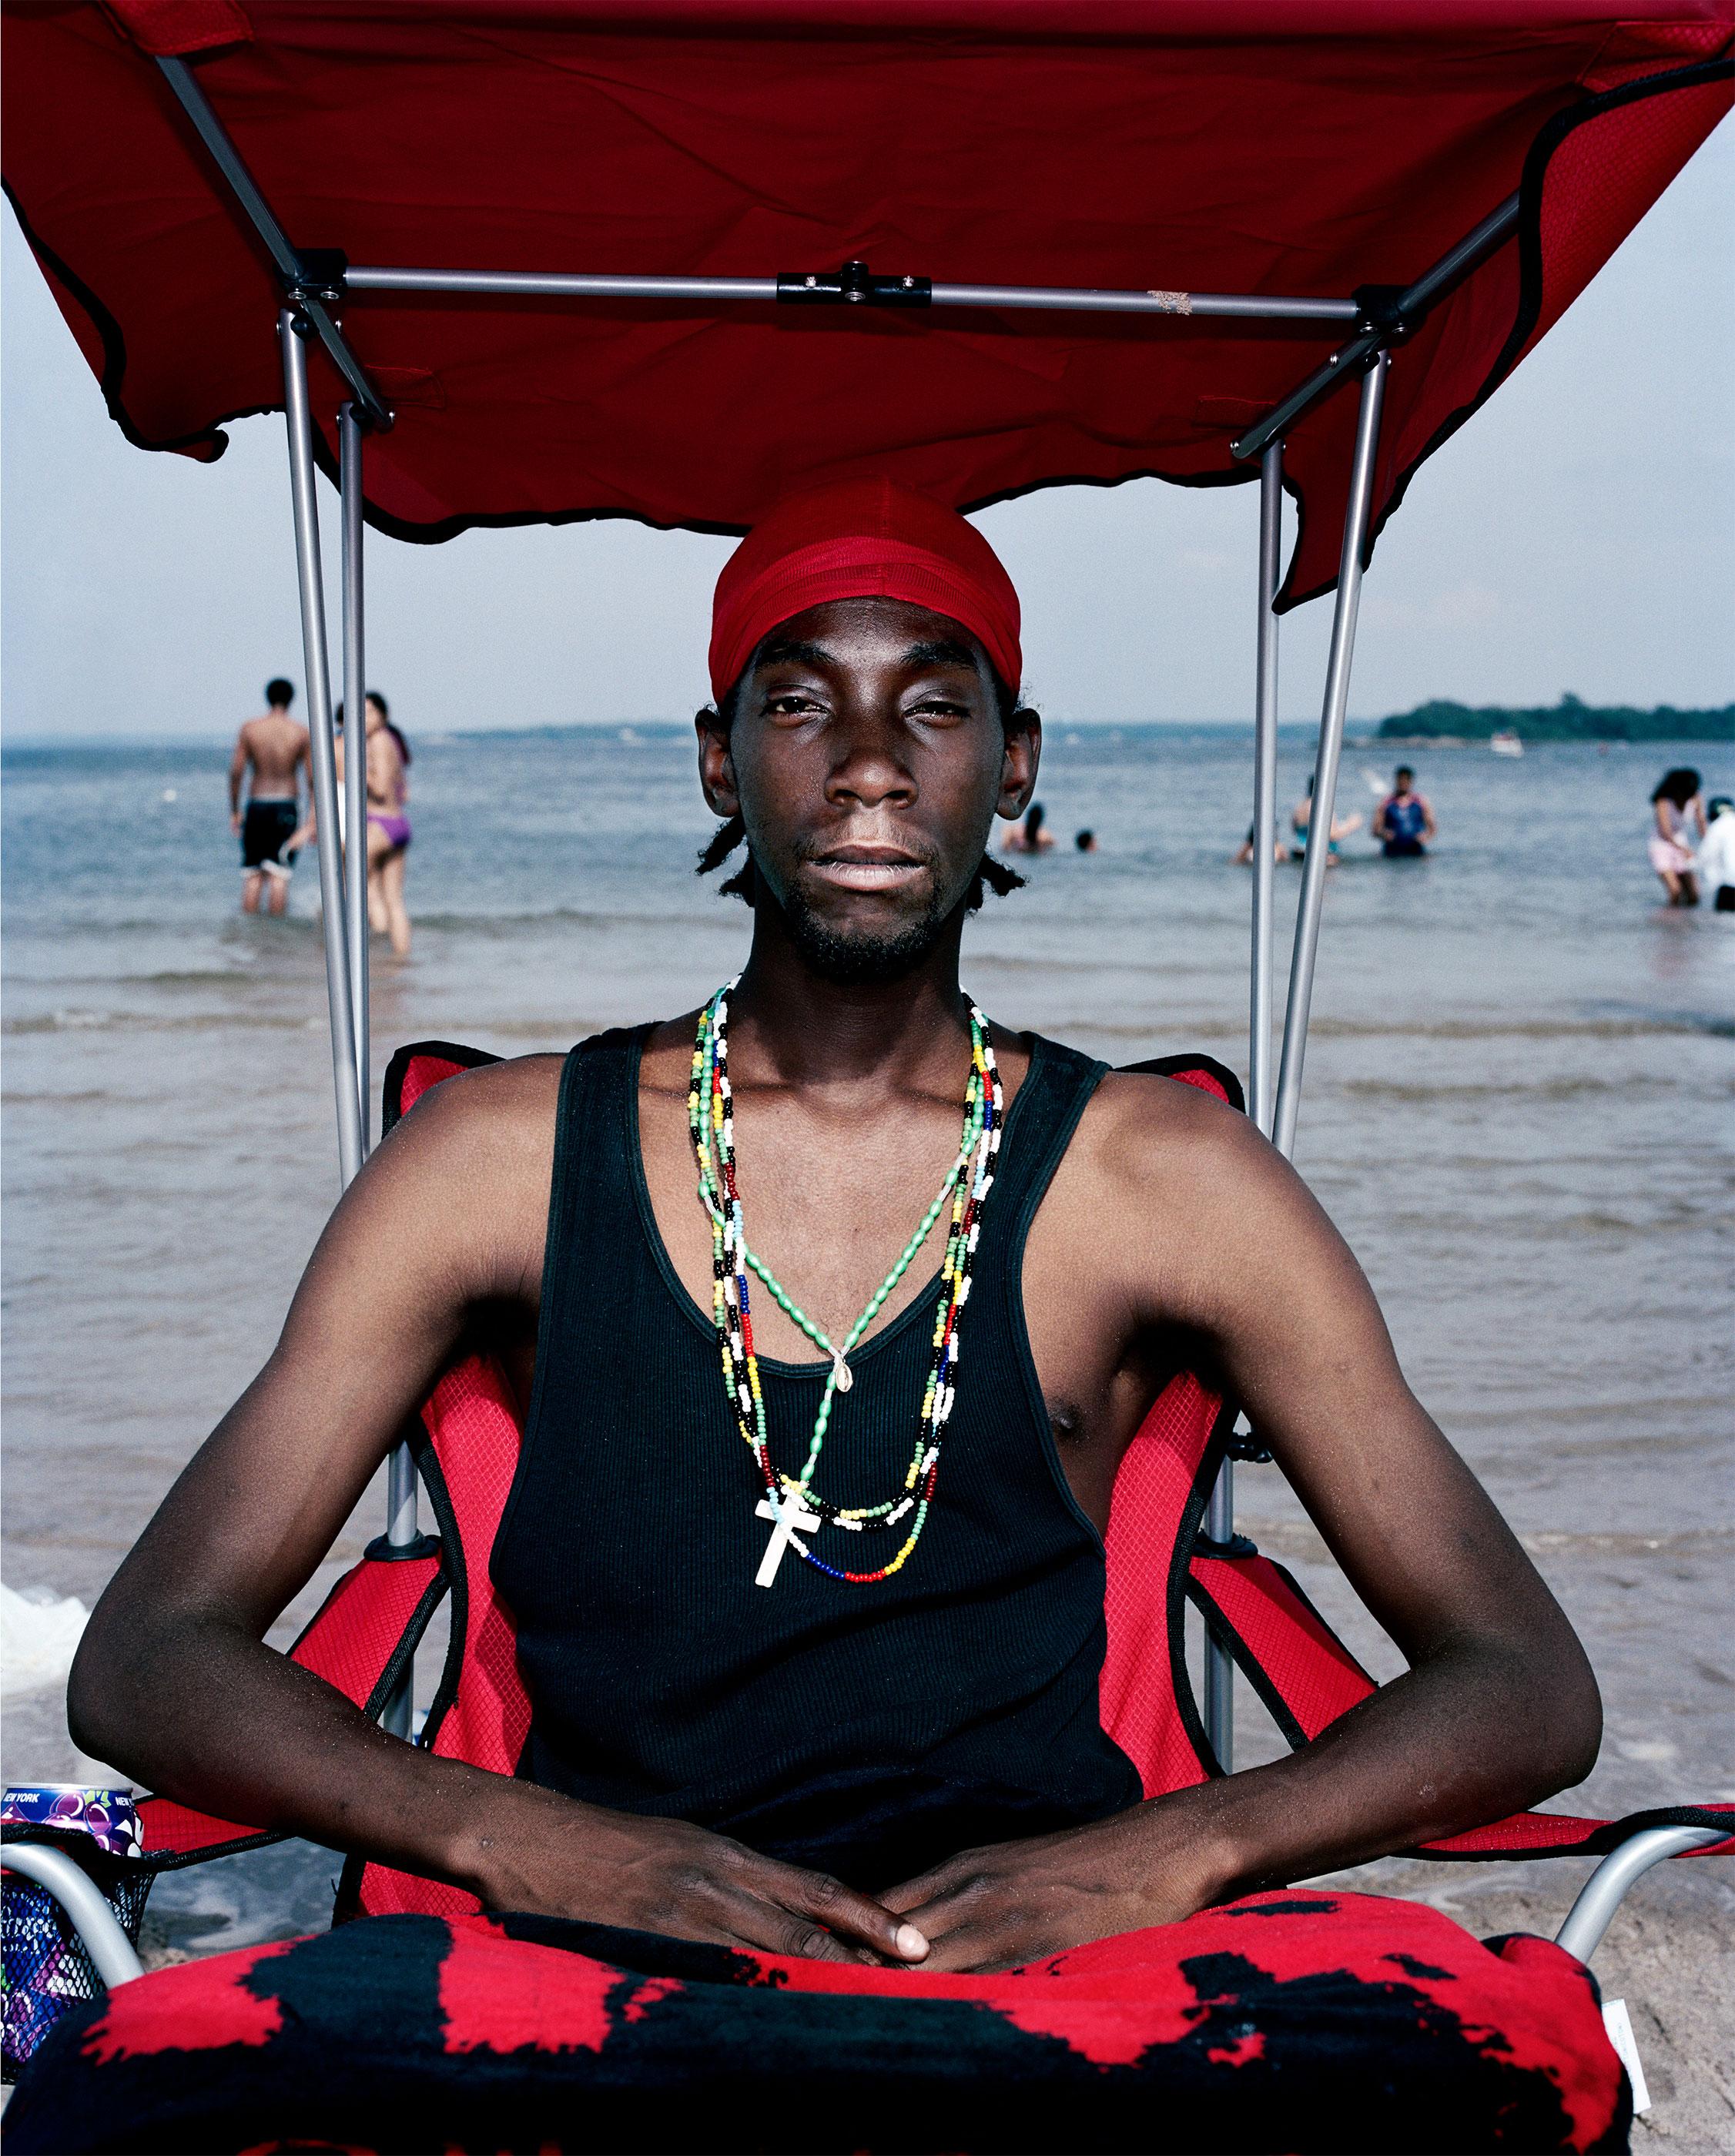 Wayne Lawrence Orchard Beach: The Bronx Riviera